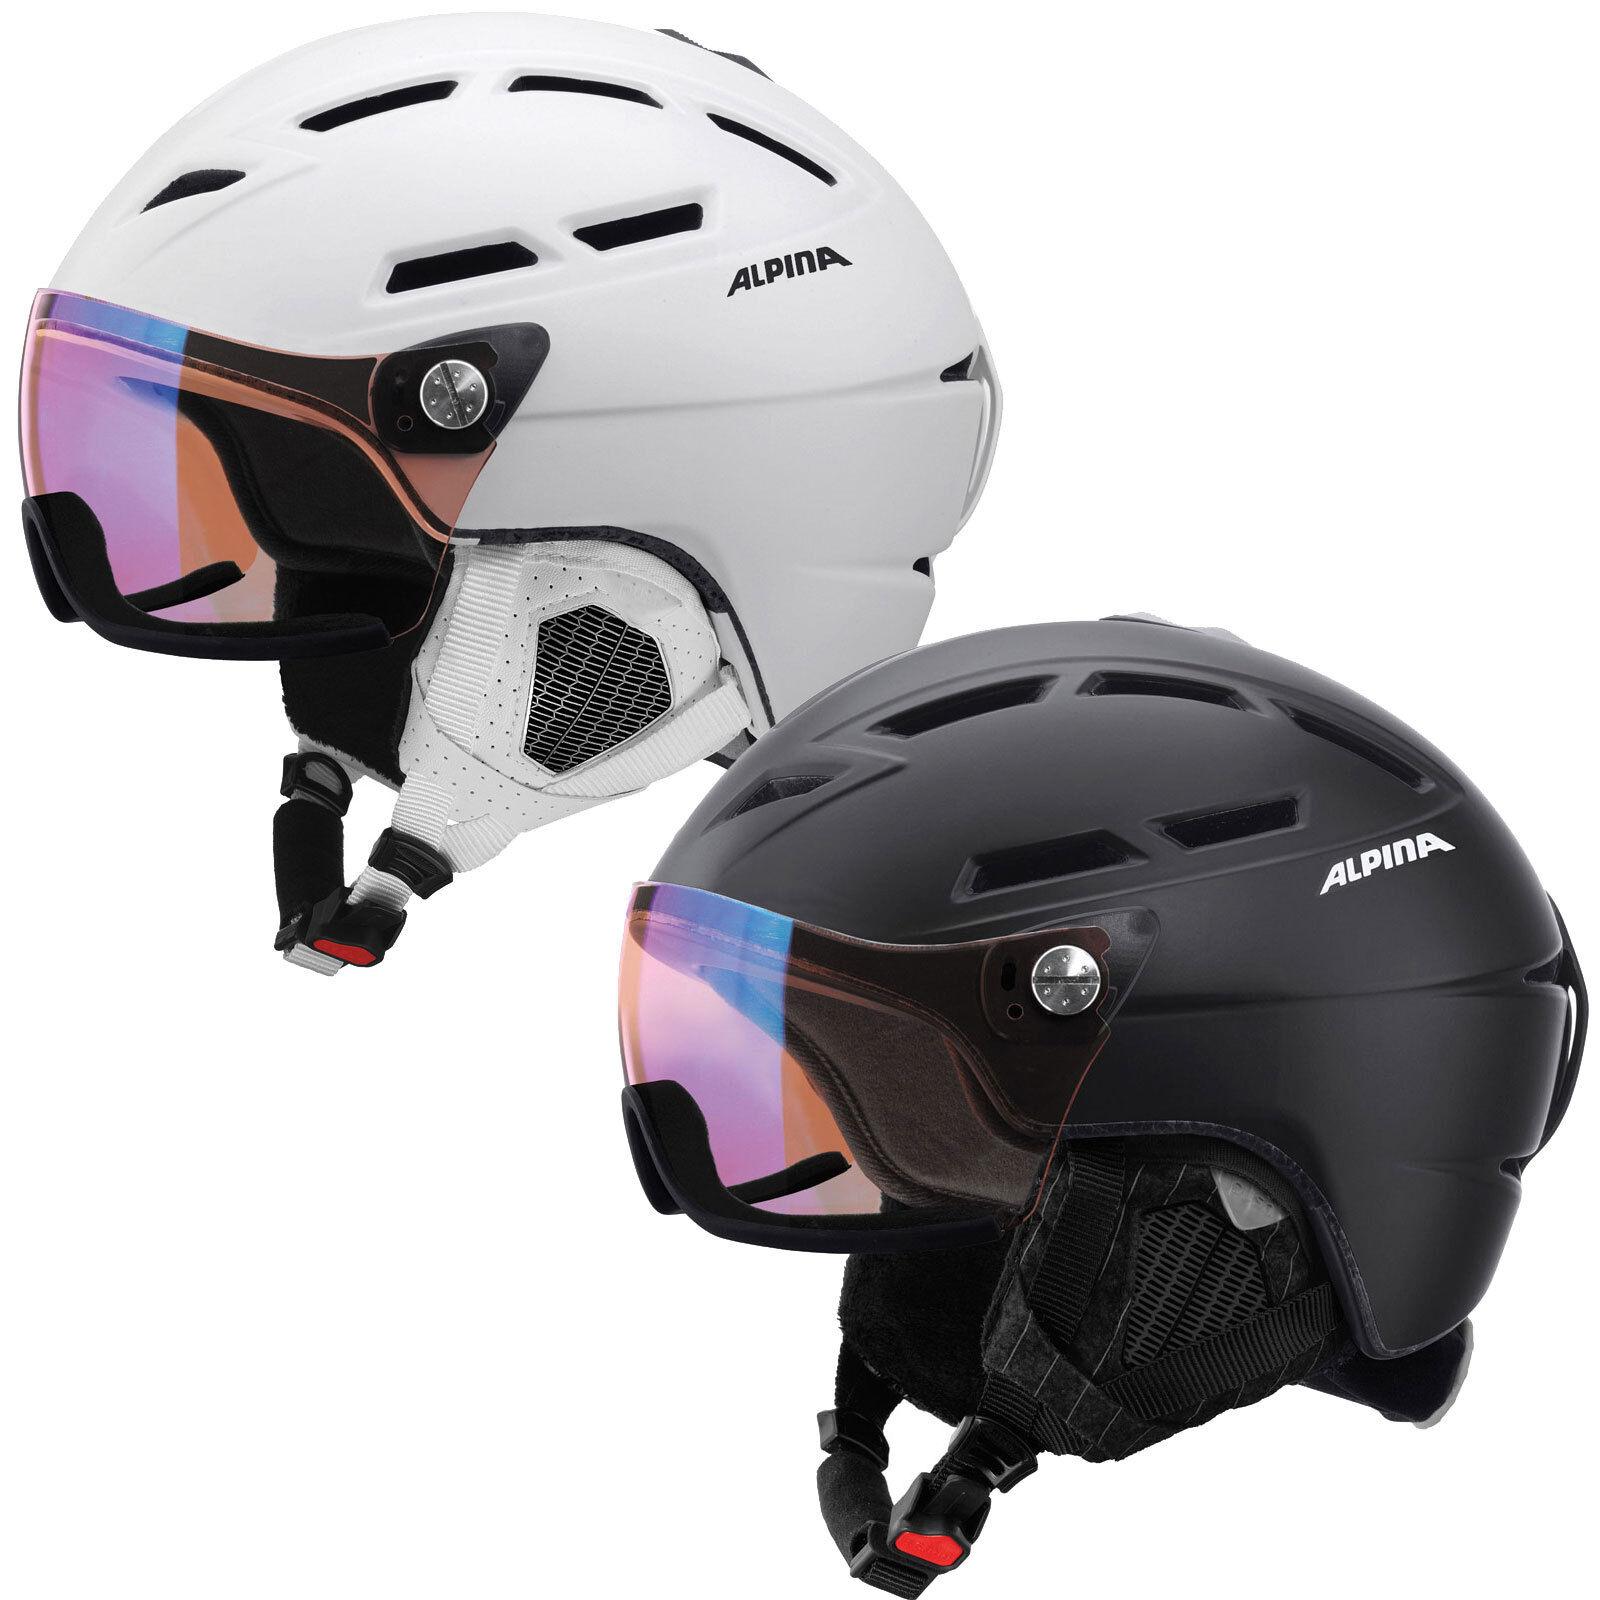 Alpina Griva Visor VHM Damen-Skihelm Damen-Skihelm Damen-Skihelm mit Visier Snowboardhelm Helm Protektion 9411ce